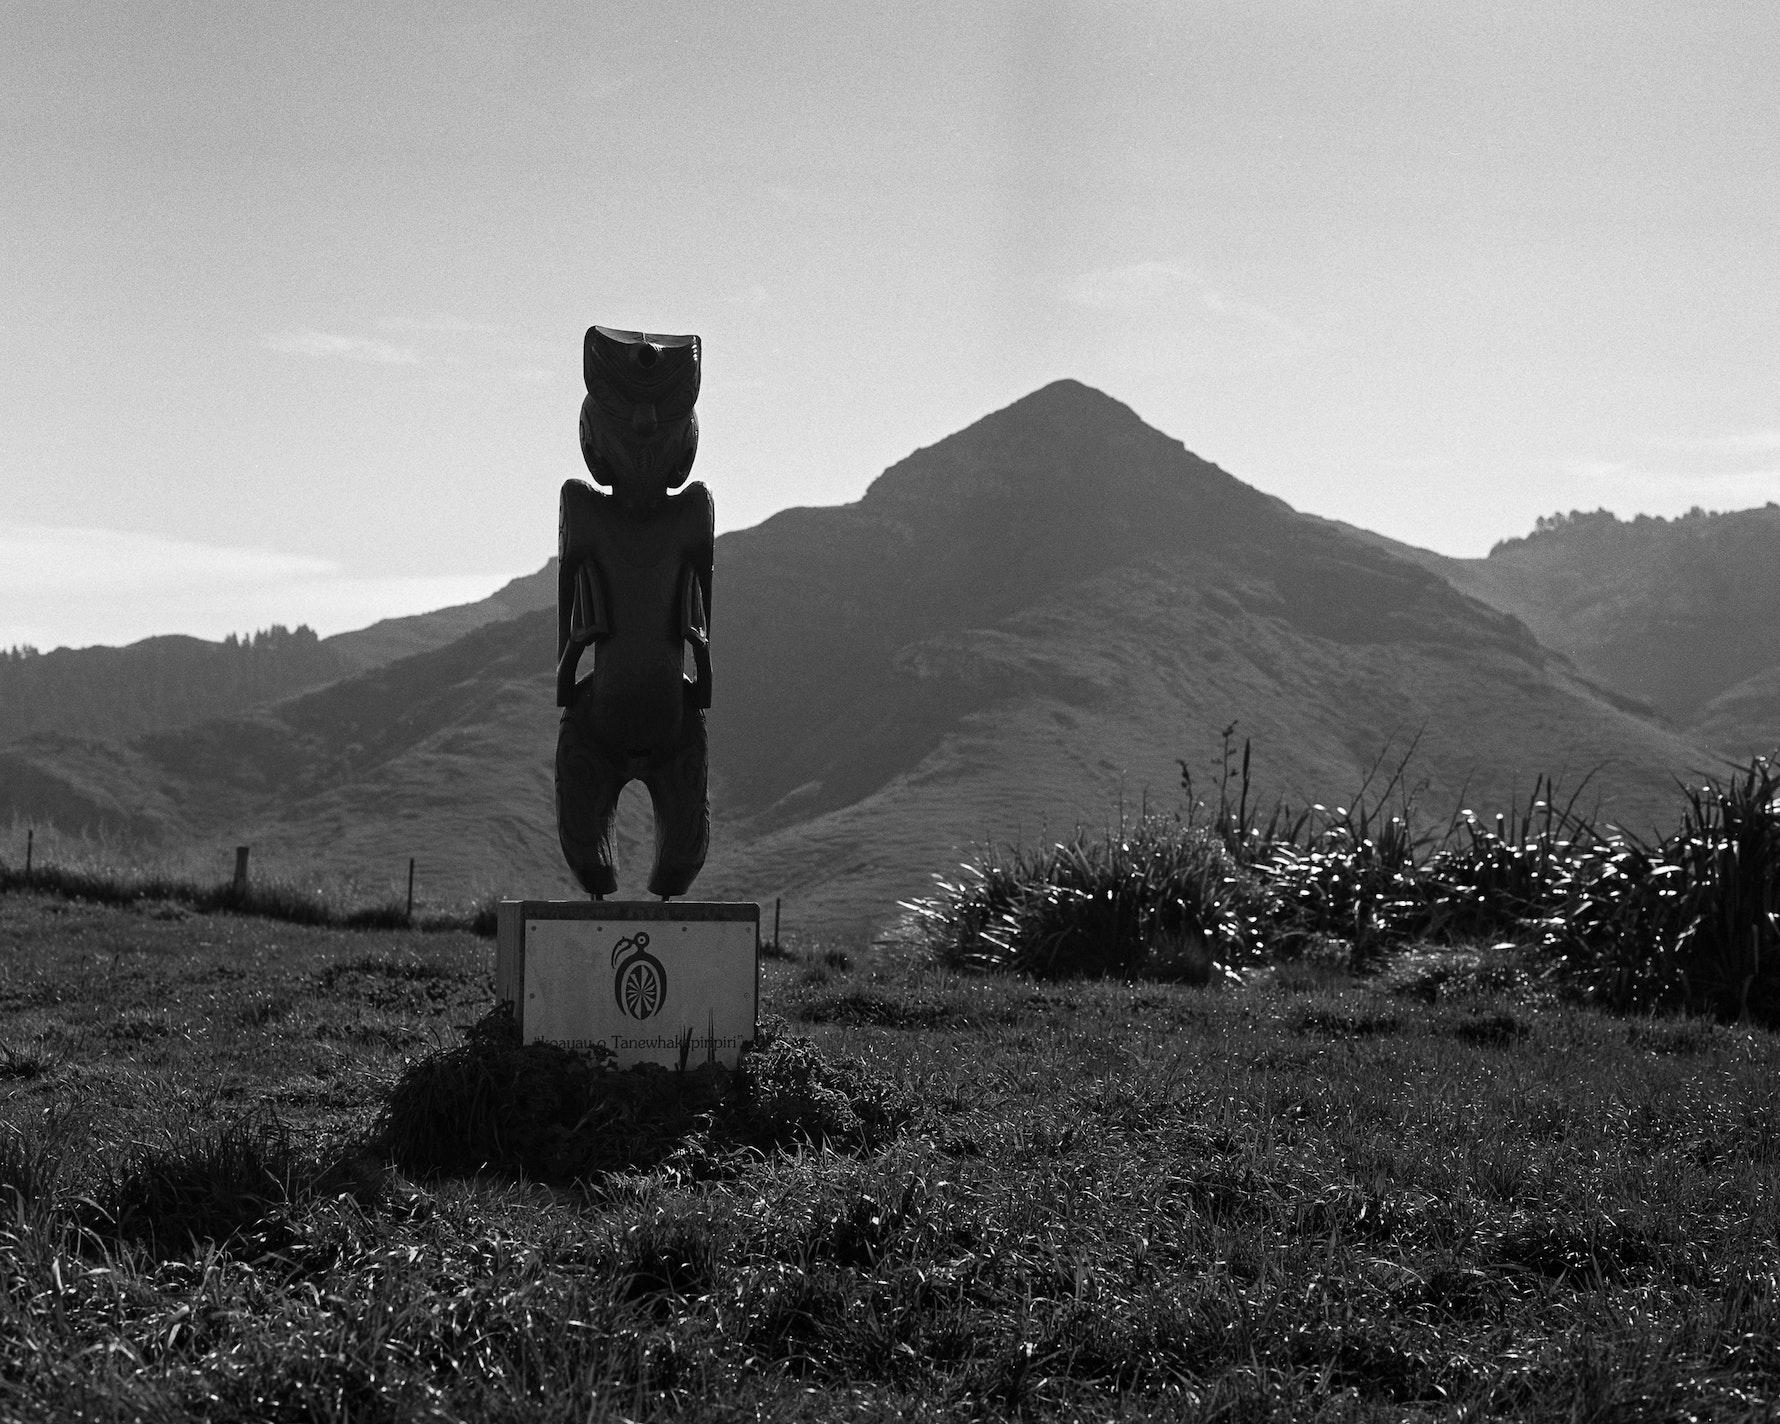 Kōauau o Tāne Whakapiripiri